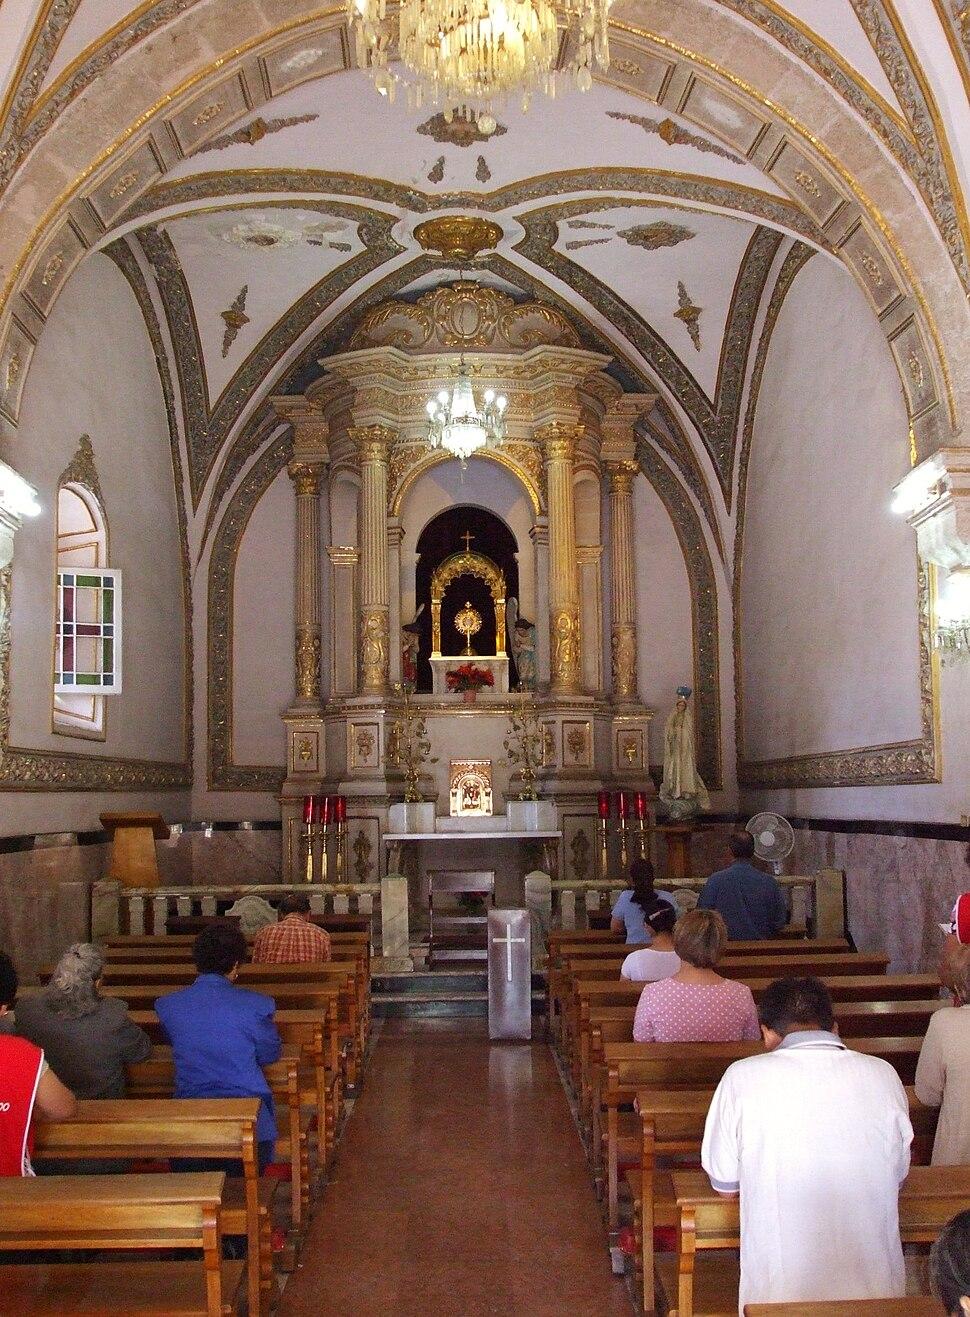 Blessed Sacrament Chapel interior